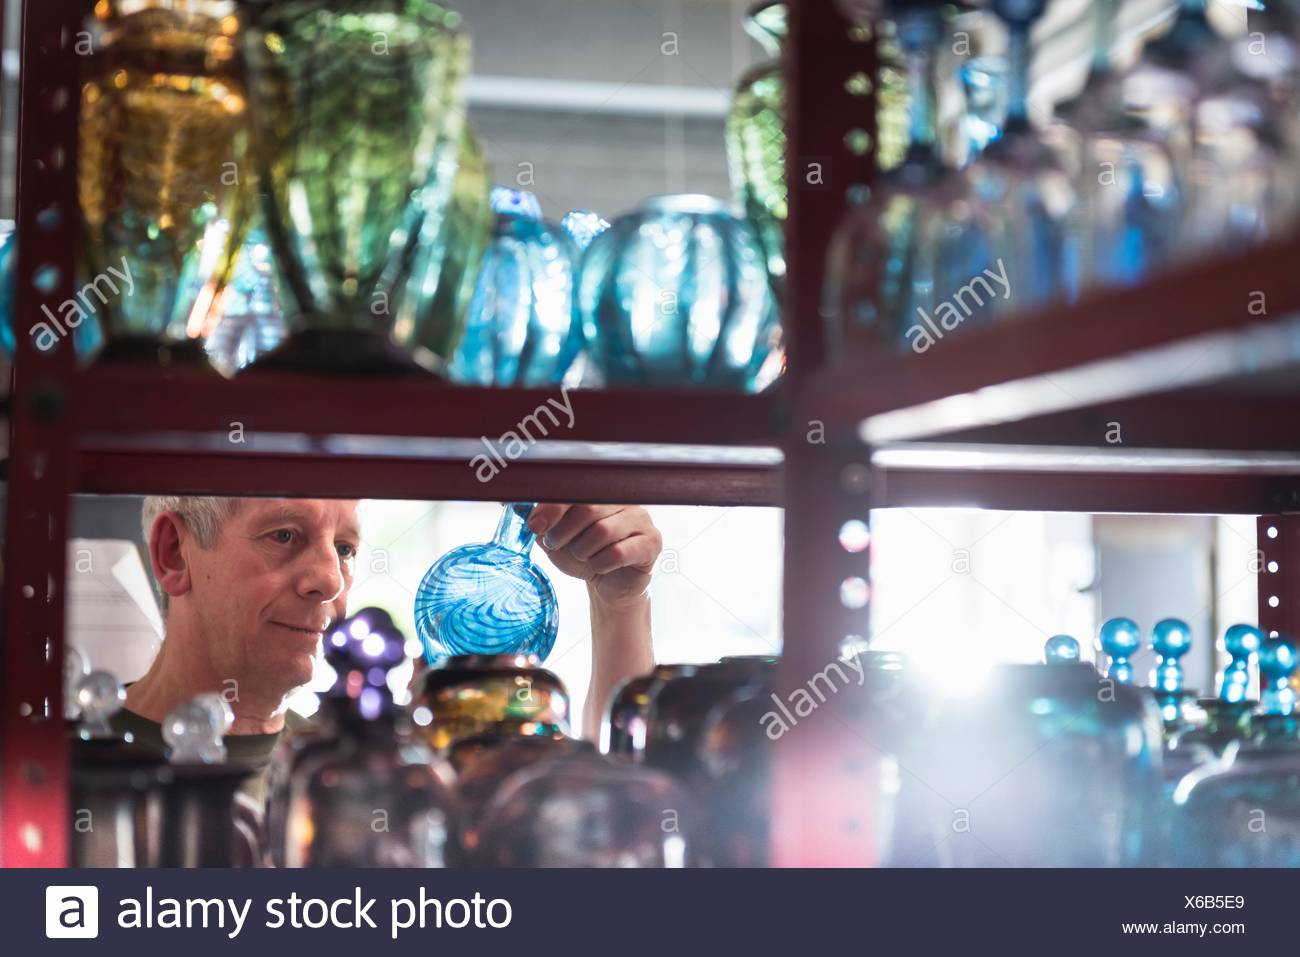 Glassblower inspecting finished glassware - Stock Image